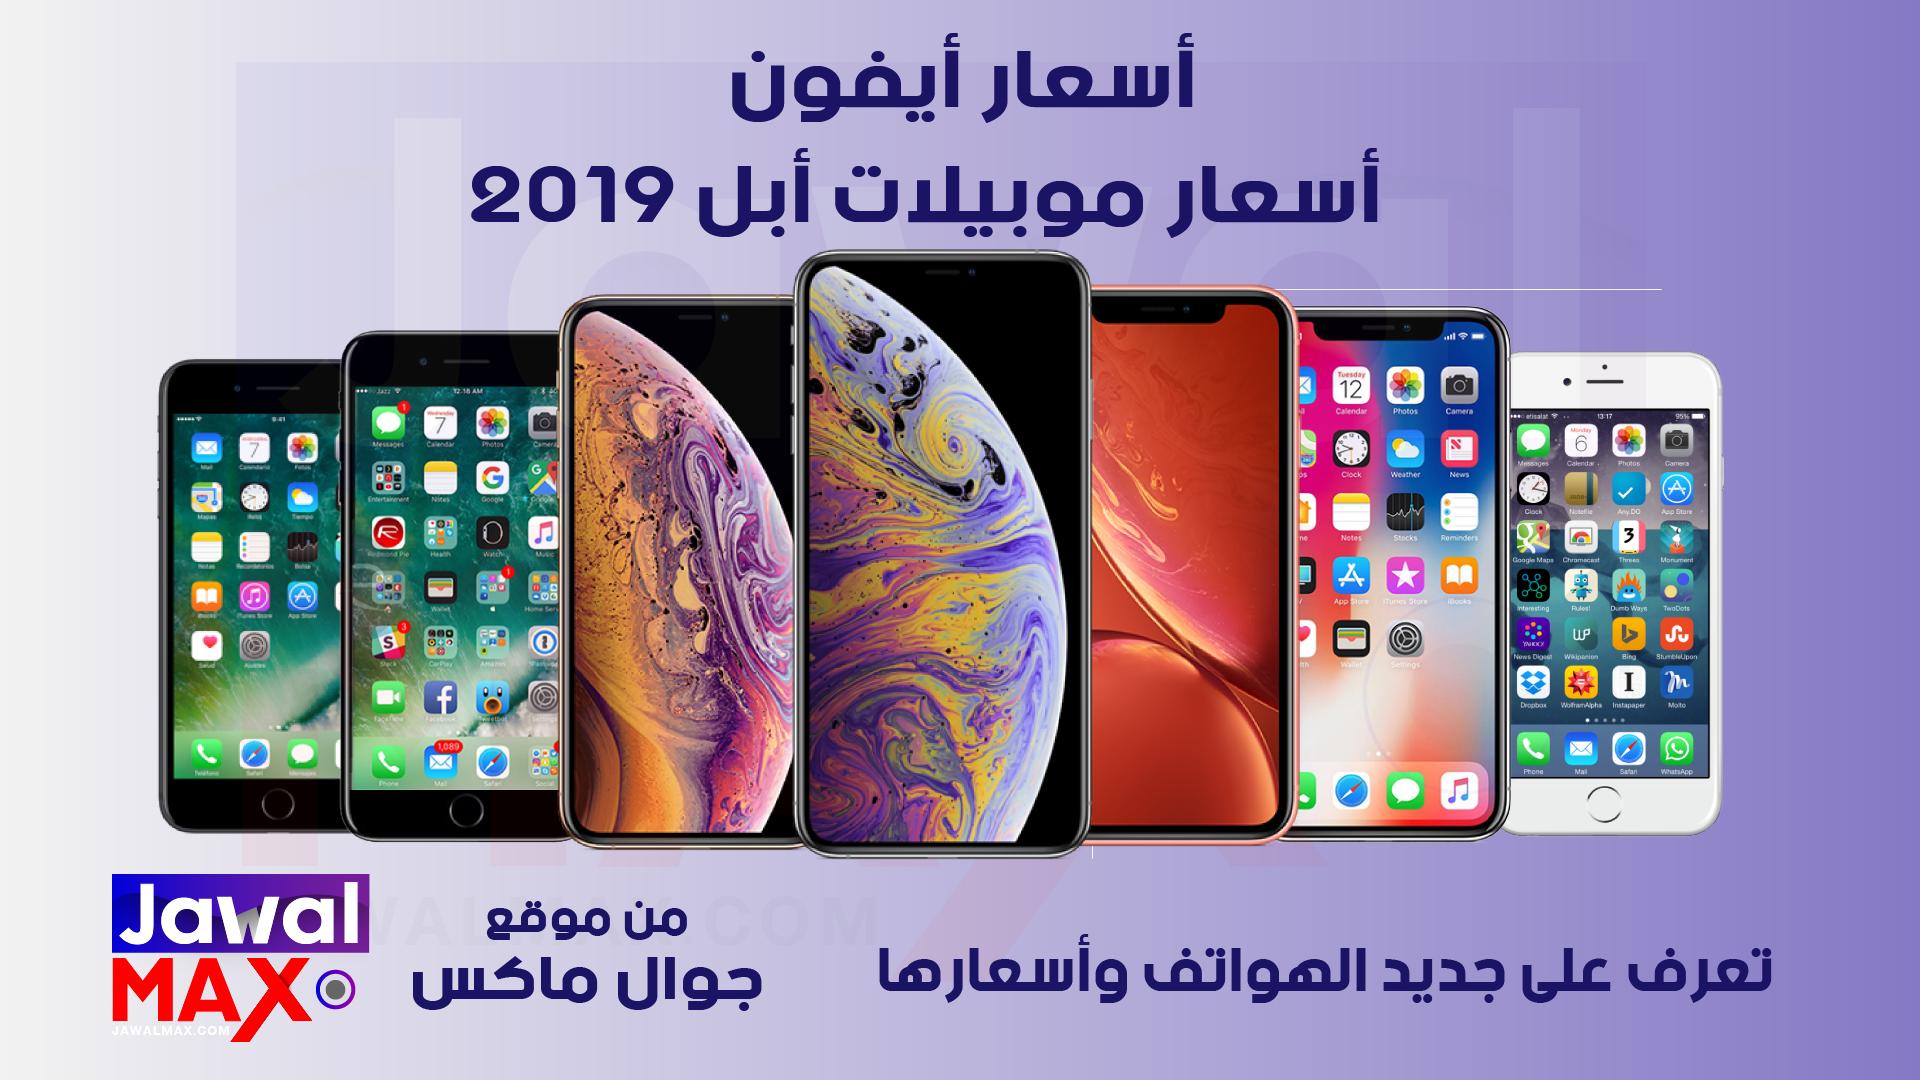 احدث اسعار ايفون في مصر شهر ديسمبر 2019 محدث جوال ماكس